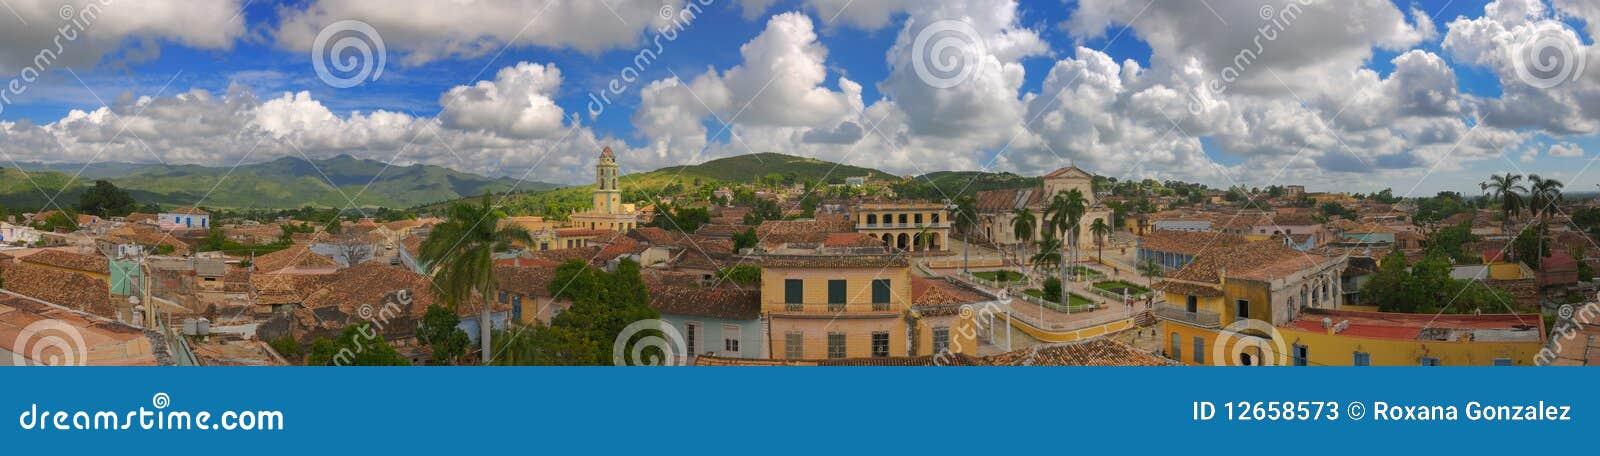 Panorama de ville du Trinidad, Cuba